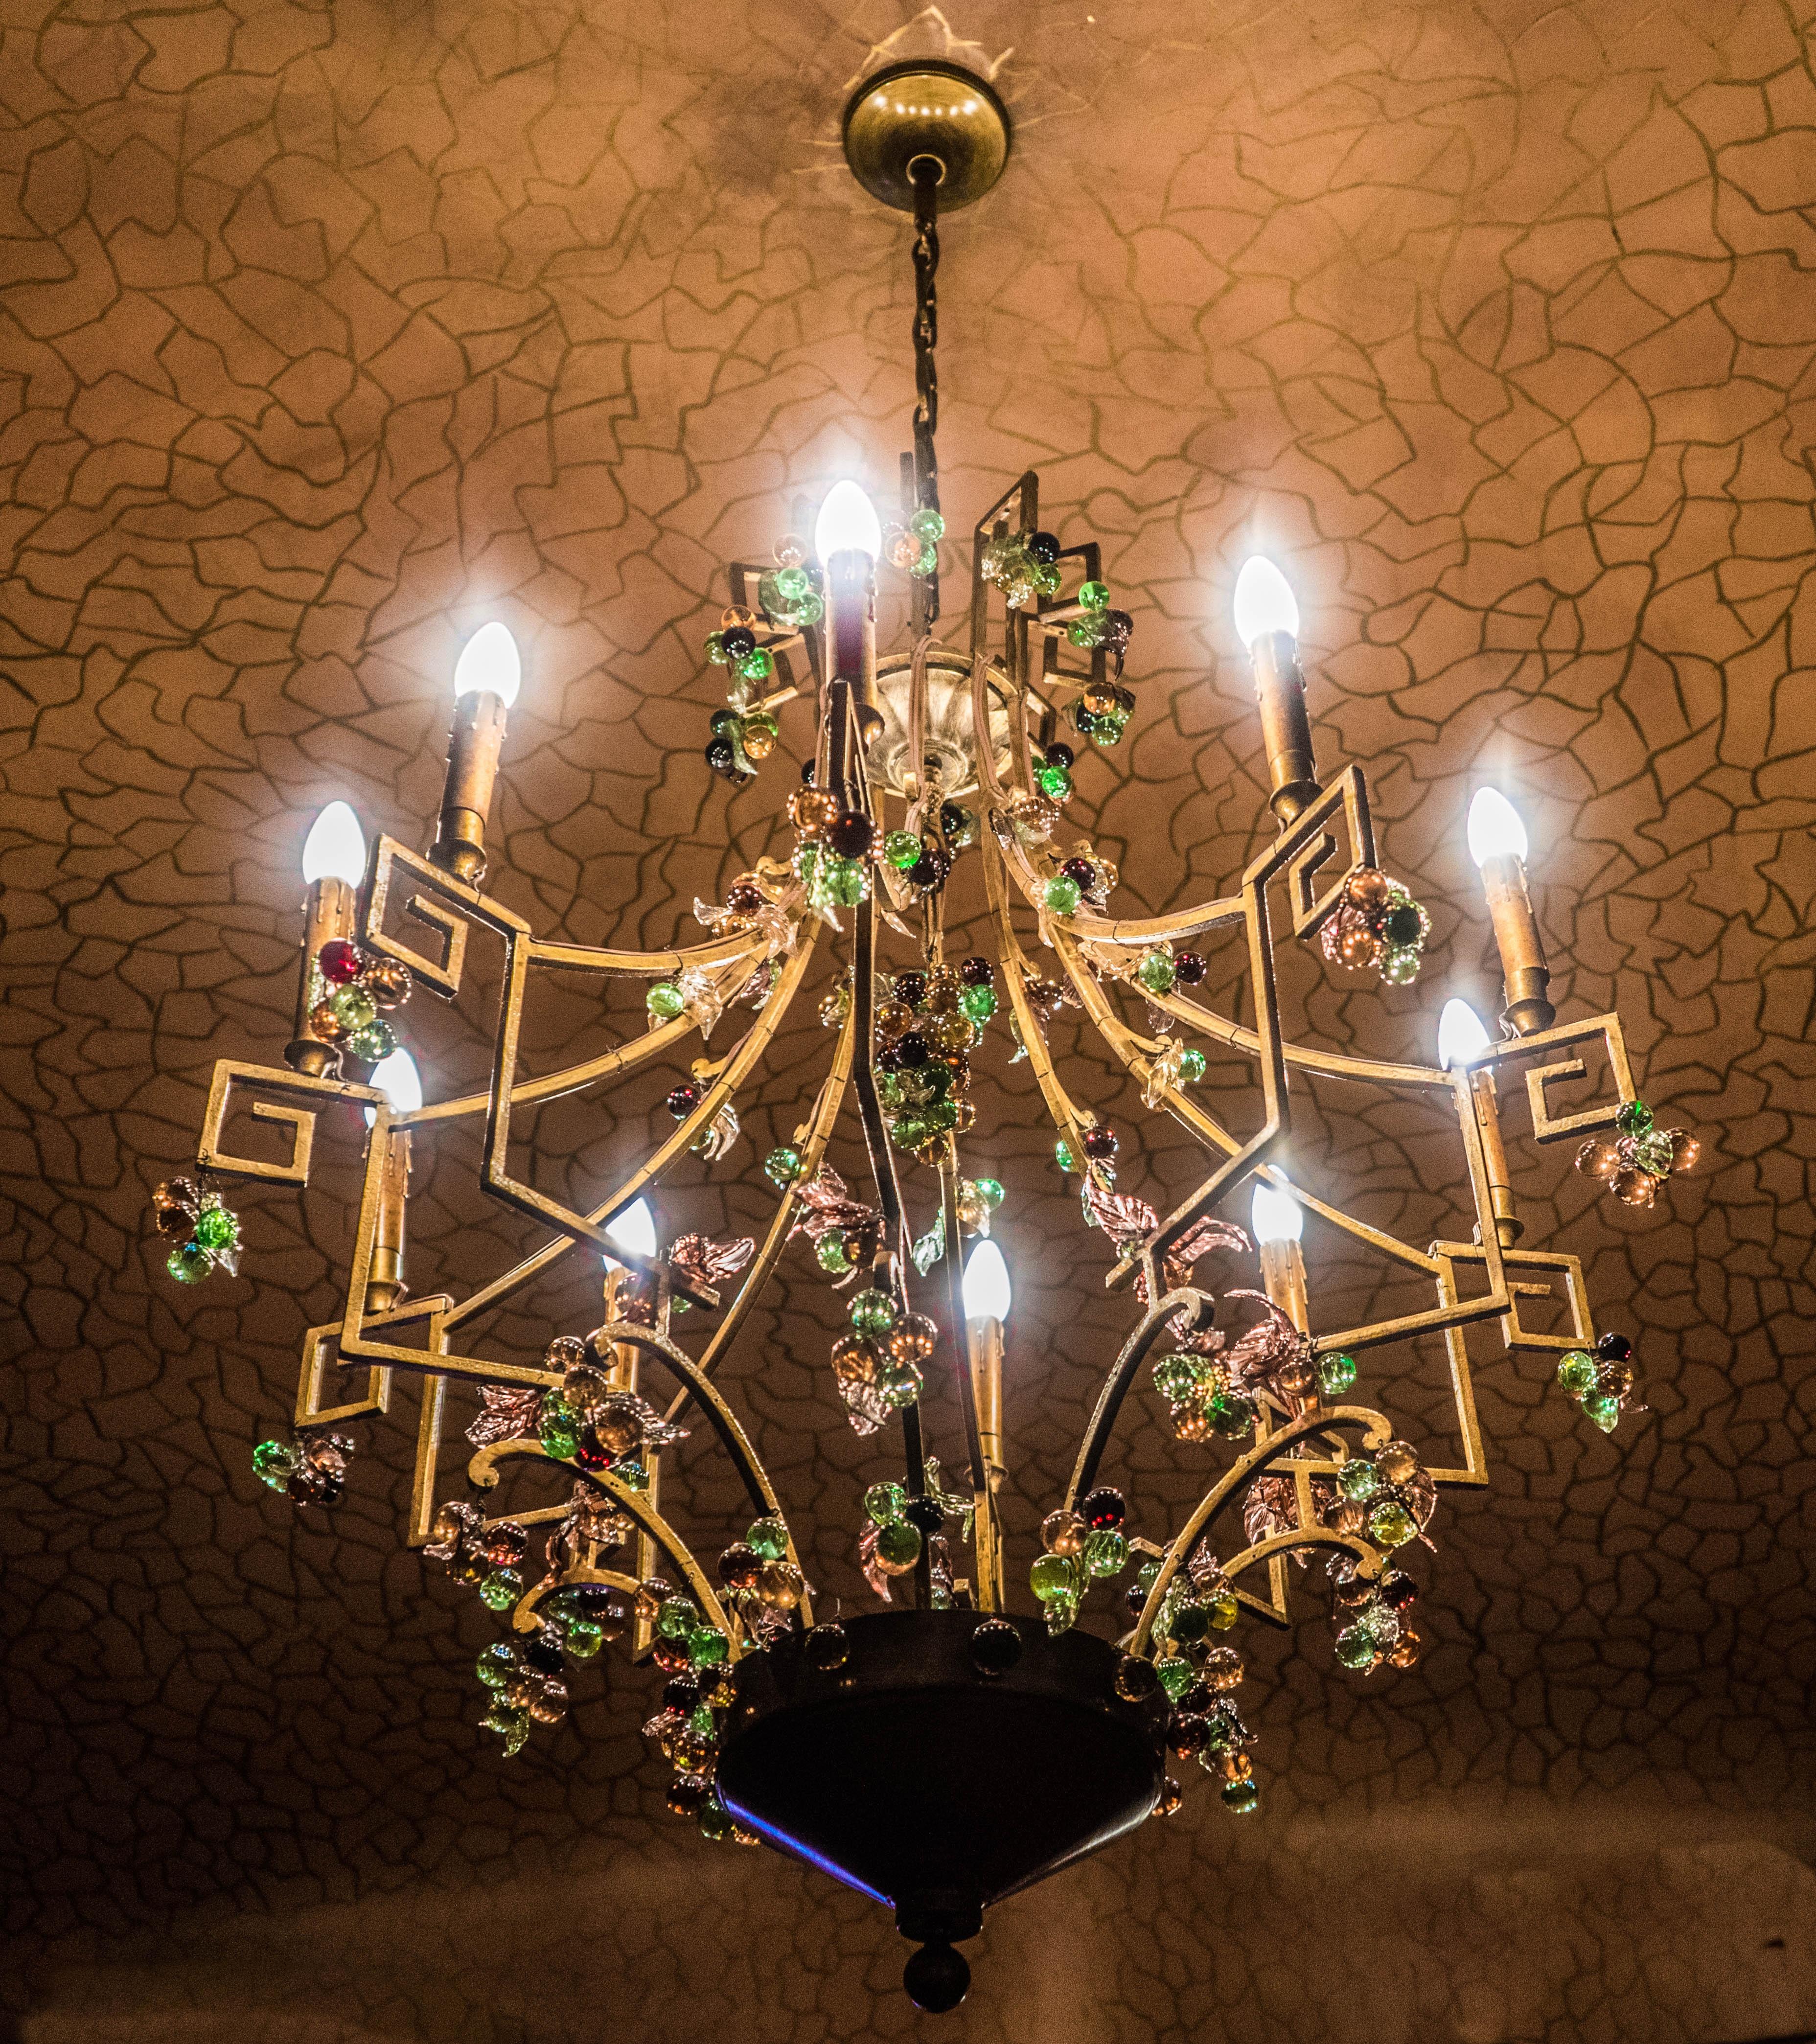 Free Images : Flower, Ceiling, Landmark, Tourism, Lighting ...